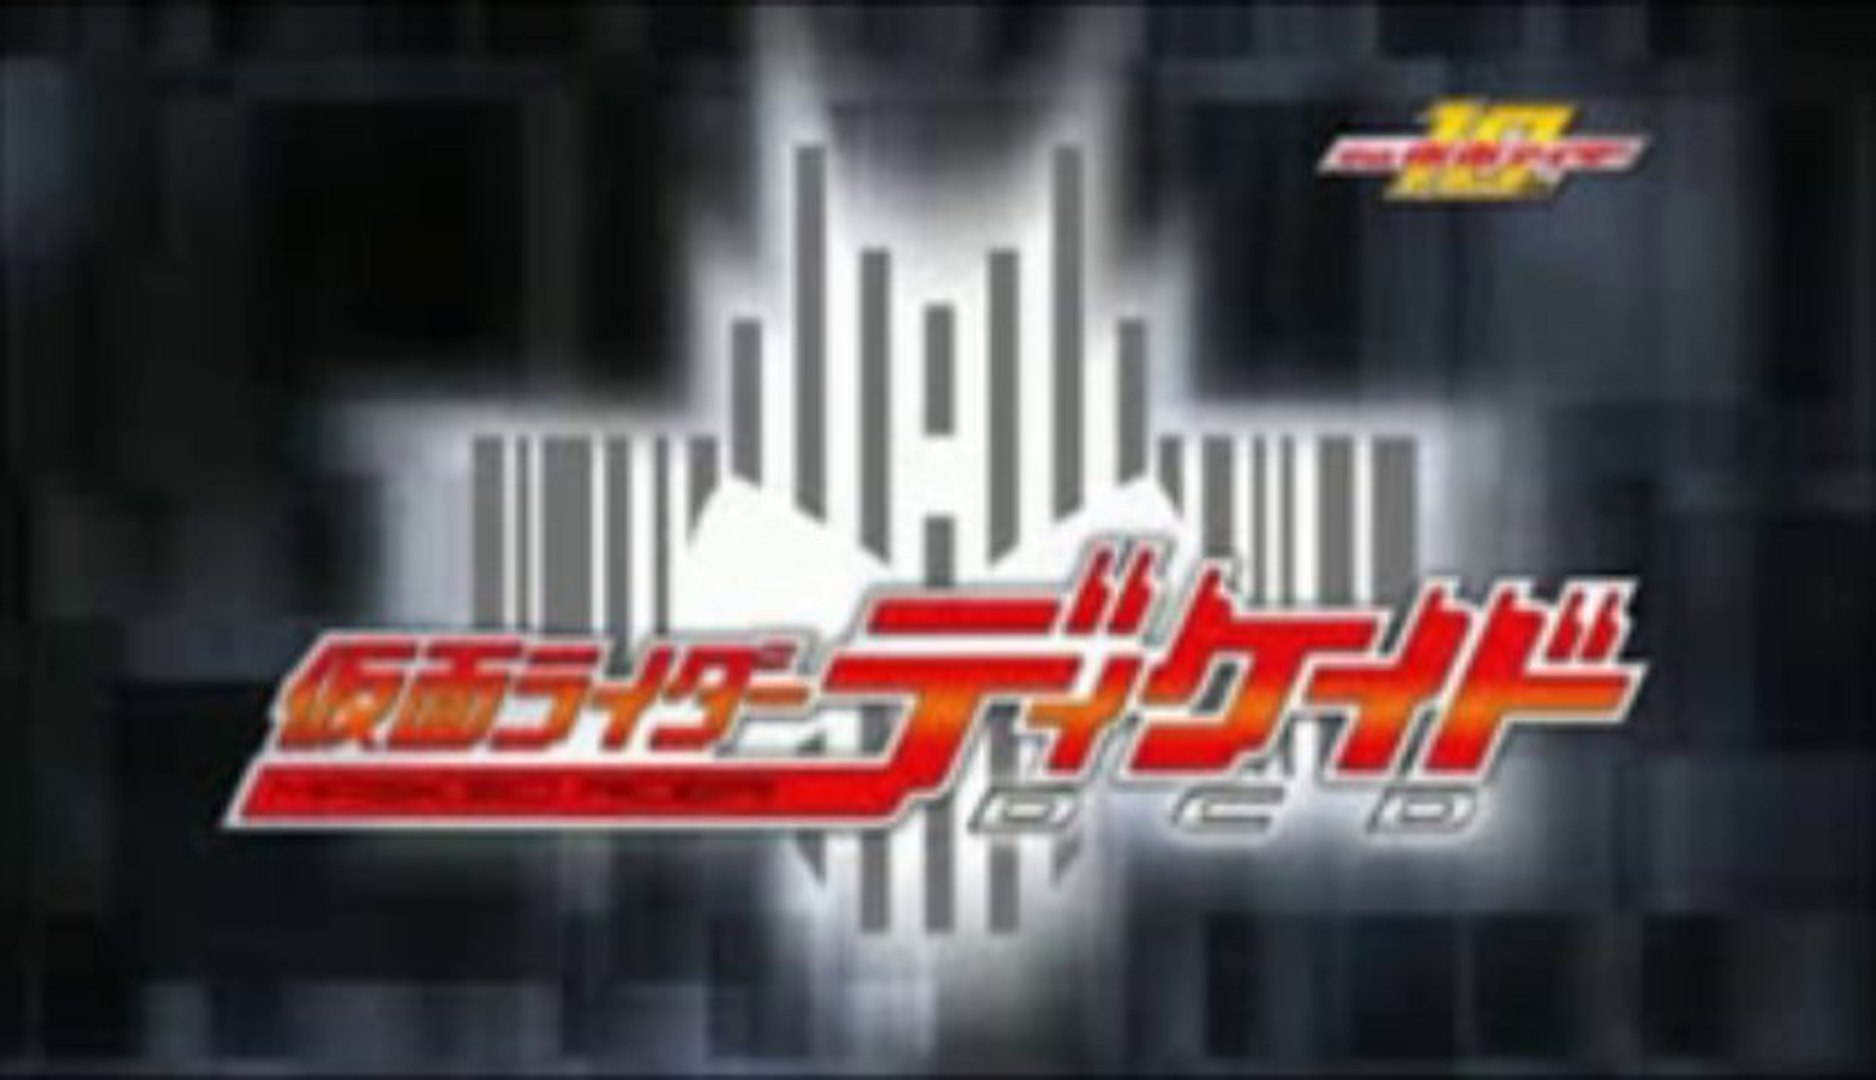 Kamen Rider Decade Opening song 'updated'